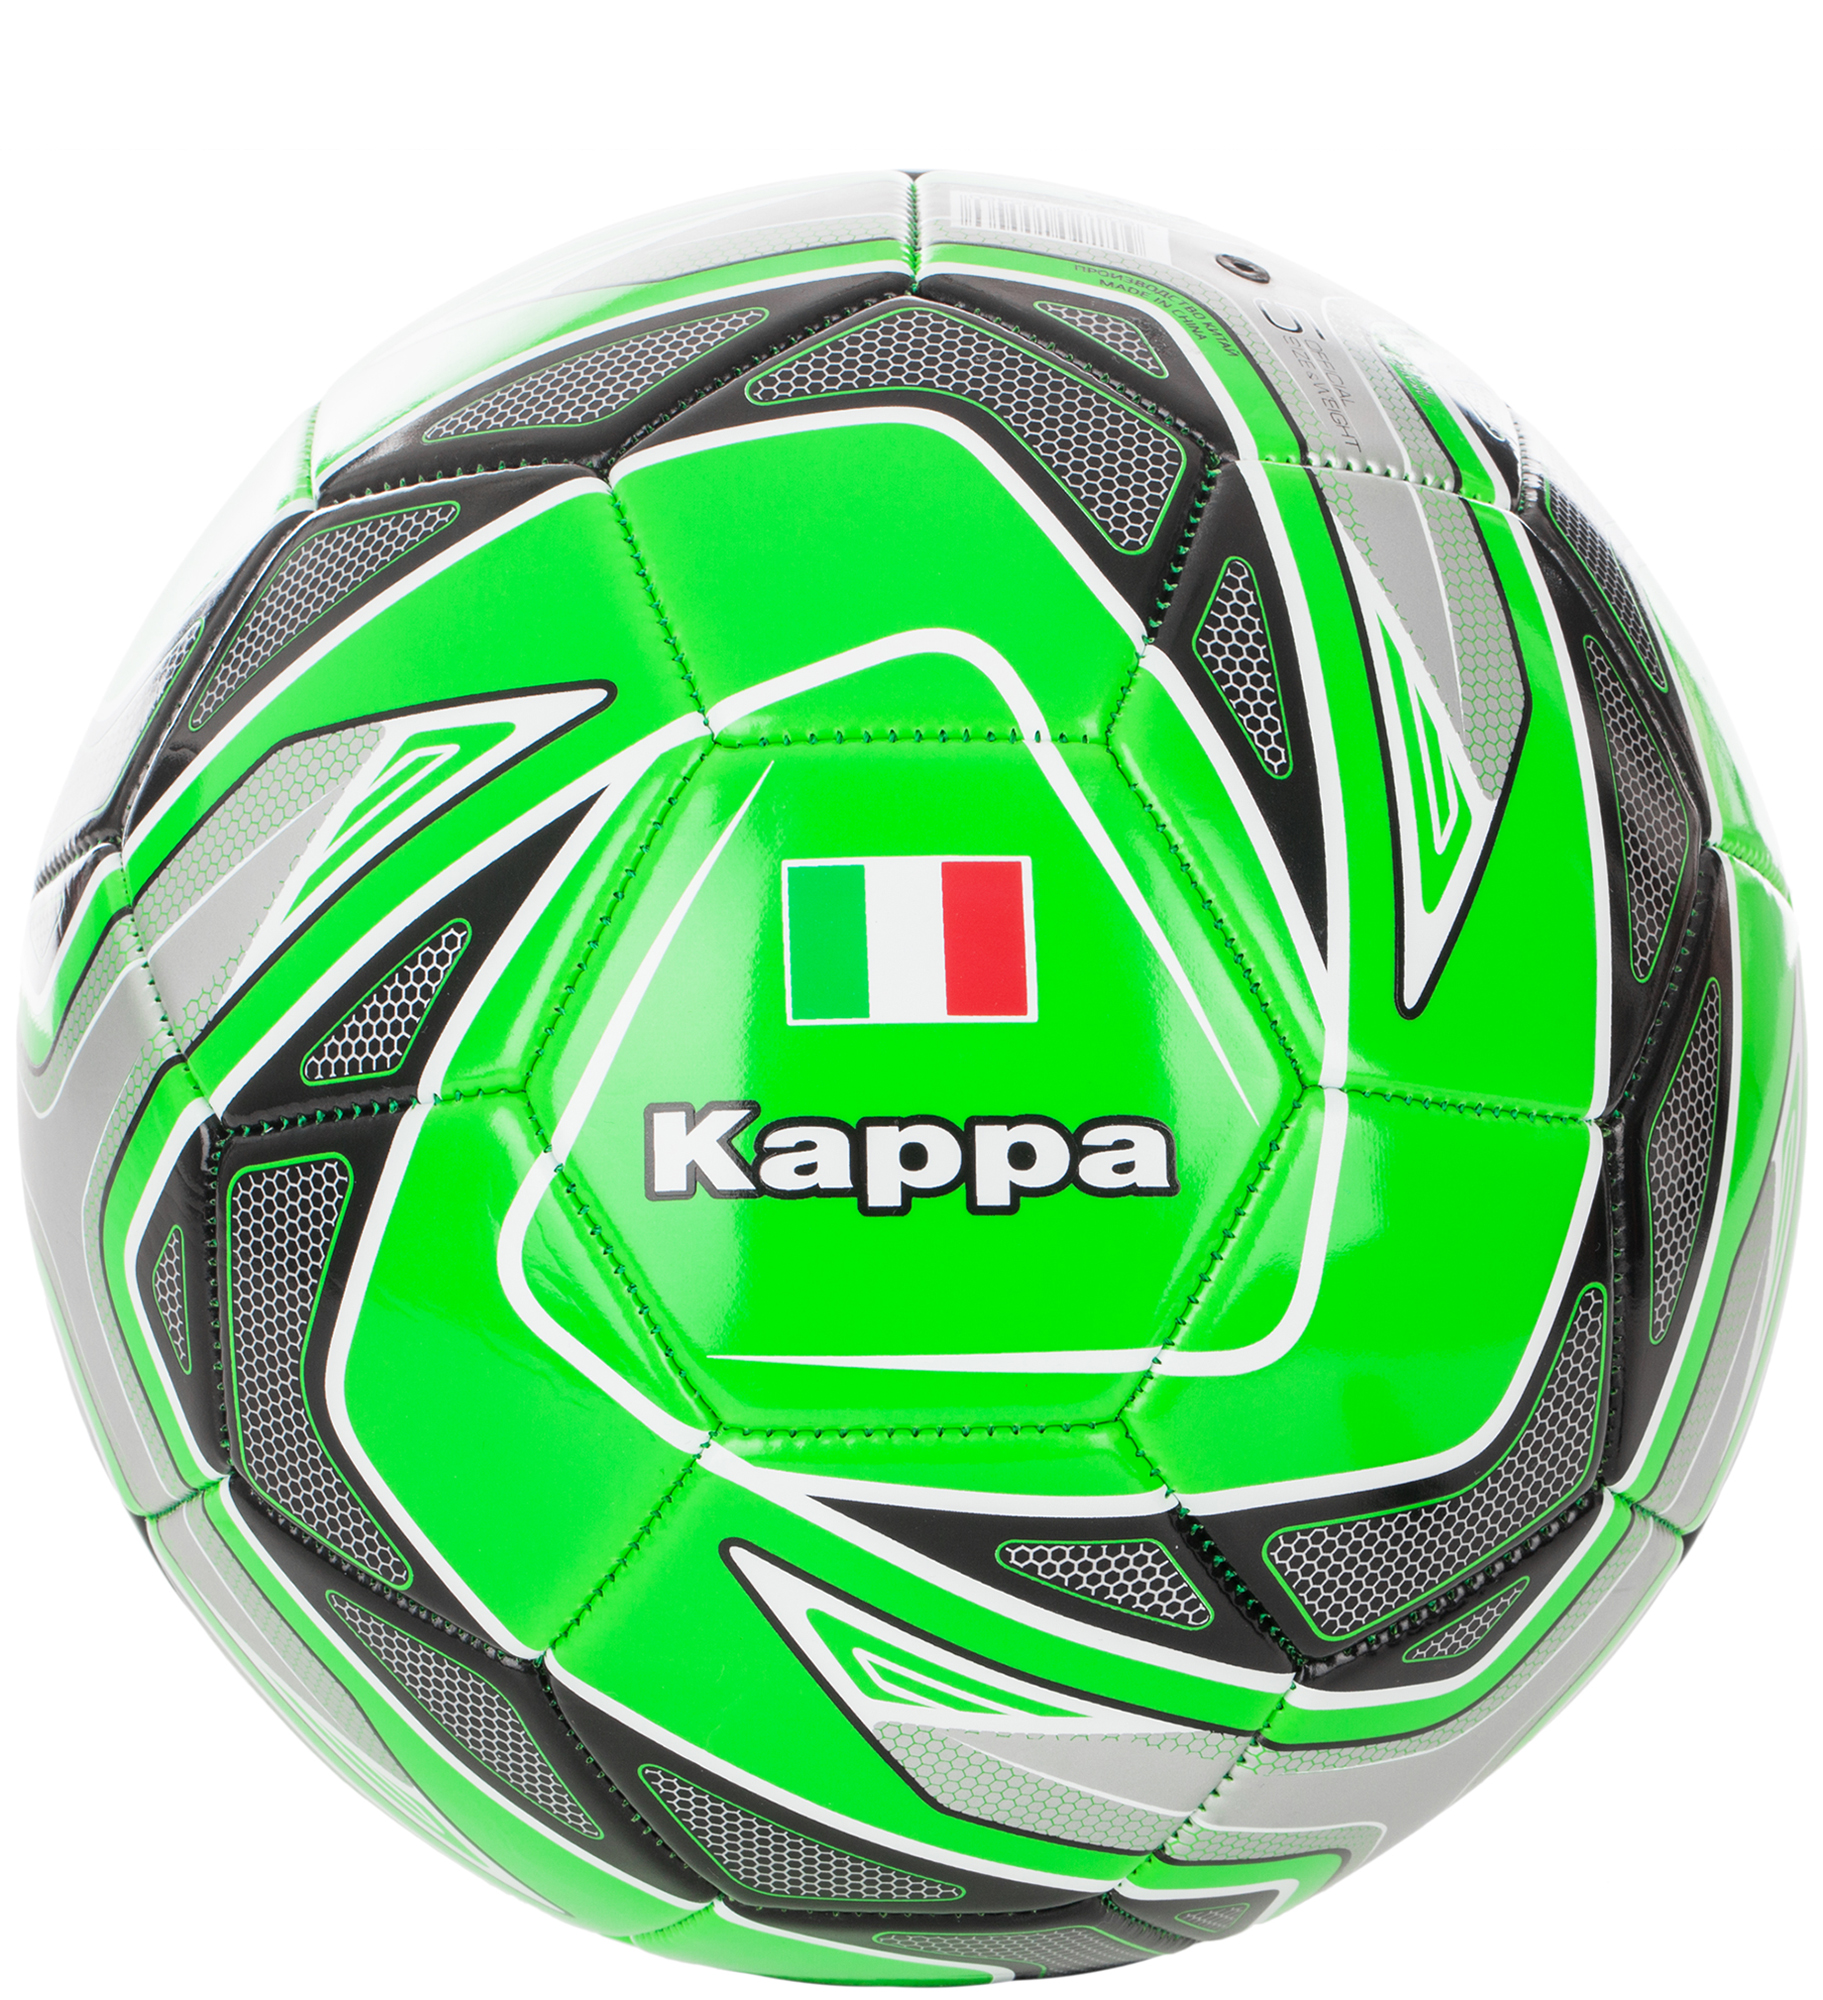 Kappa Мяч футбольный Kappa kappa жилет утепленный женский kappa